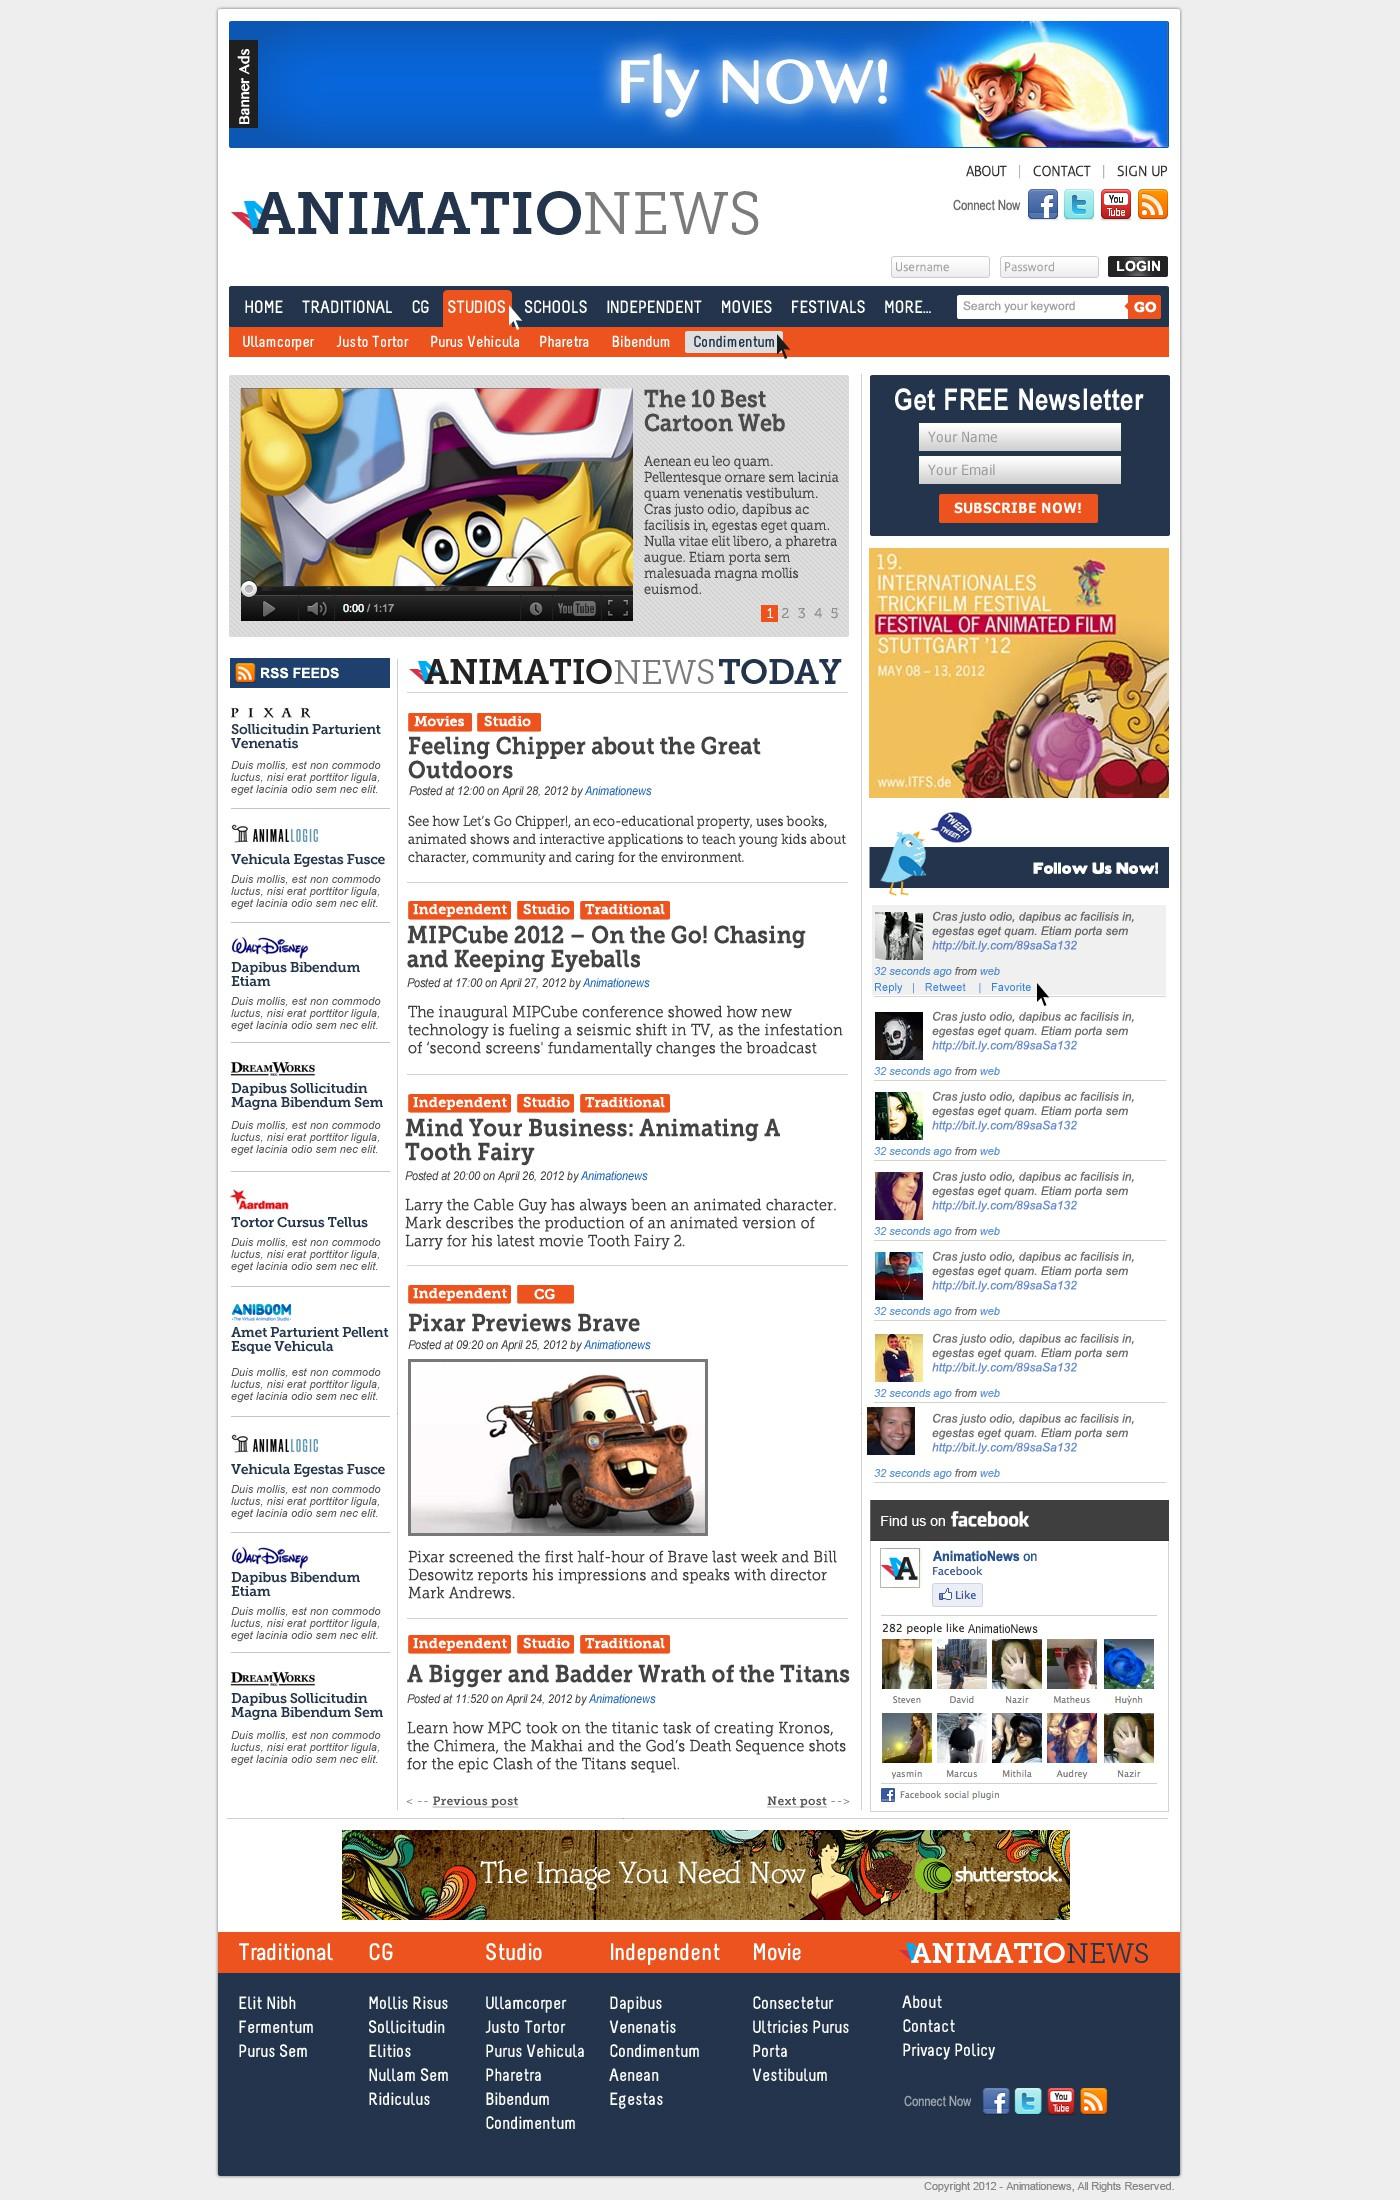 Site design for animation news portal